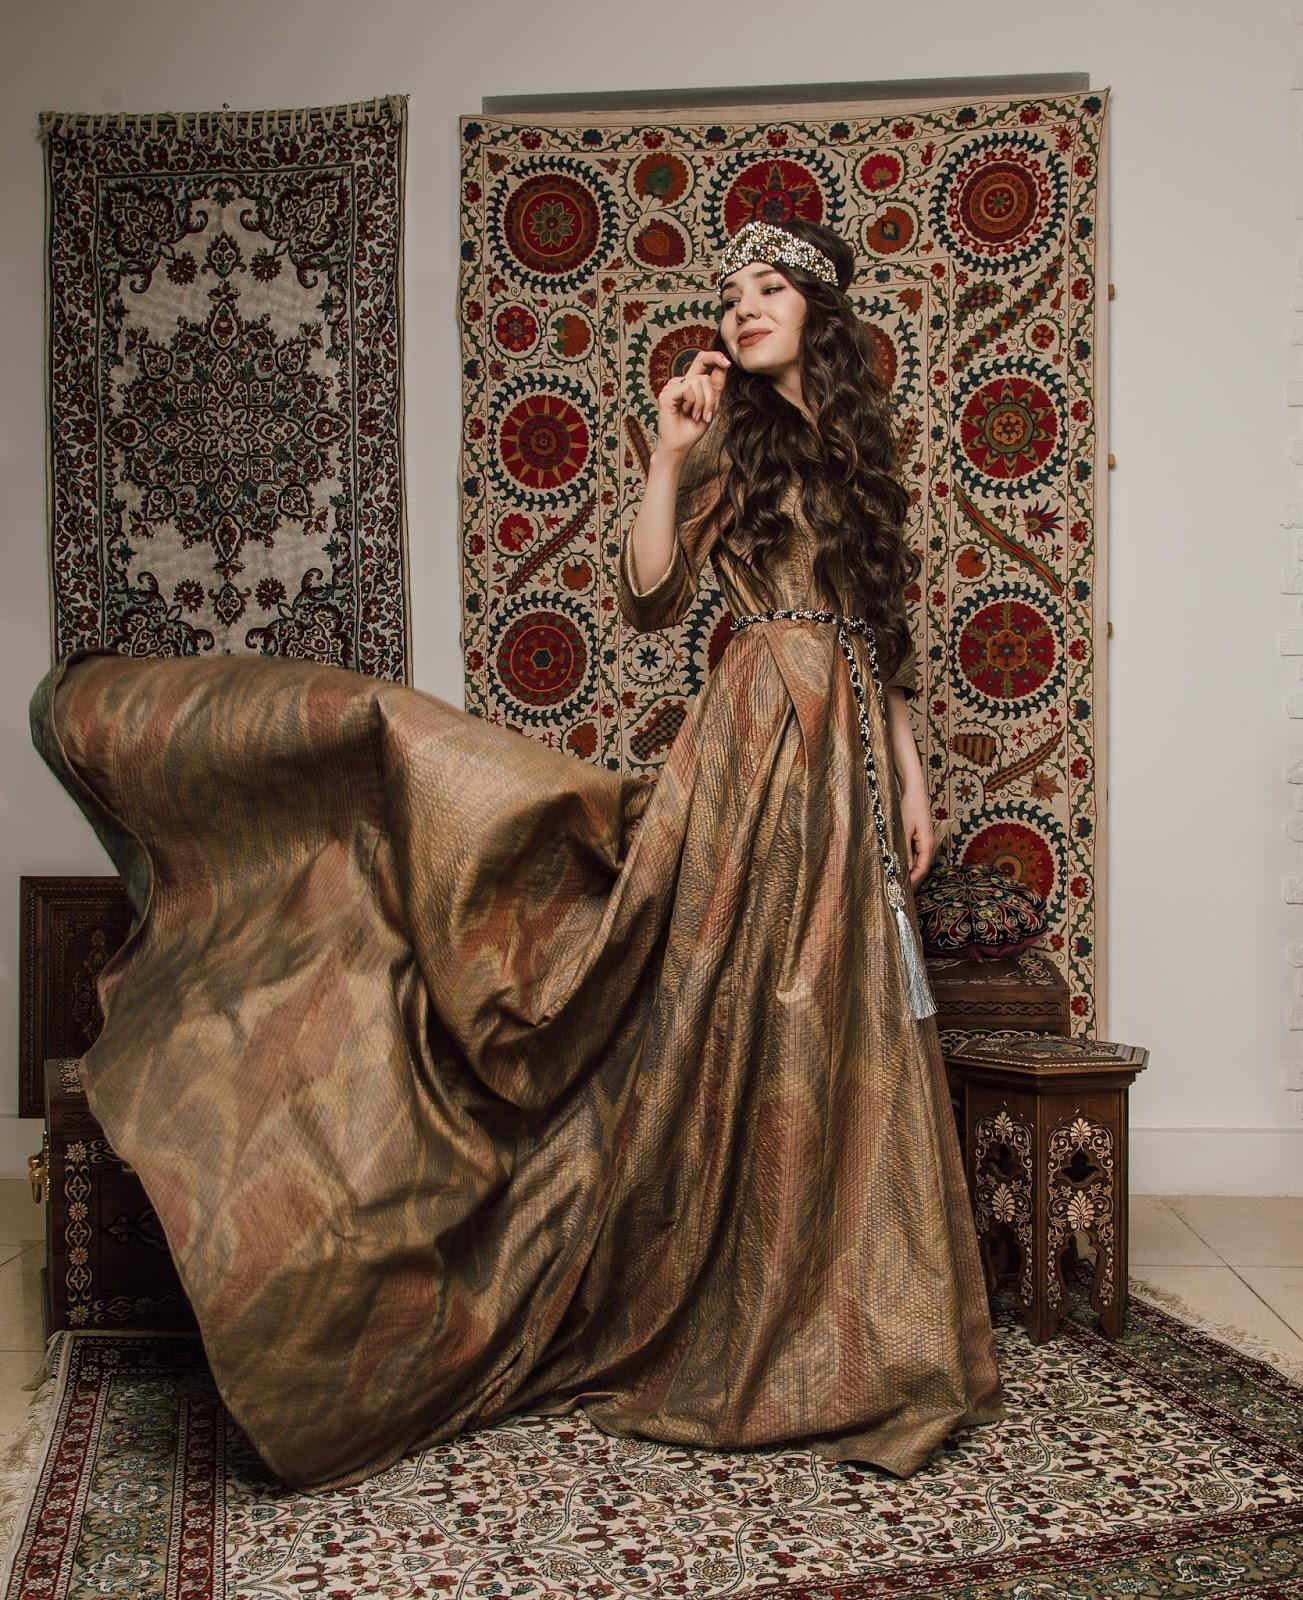 fashion blogger diyorasnotes diyora beta artboxuz artbox national print uzbek print uzbek bride